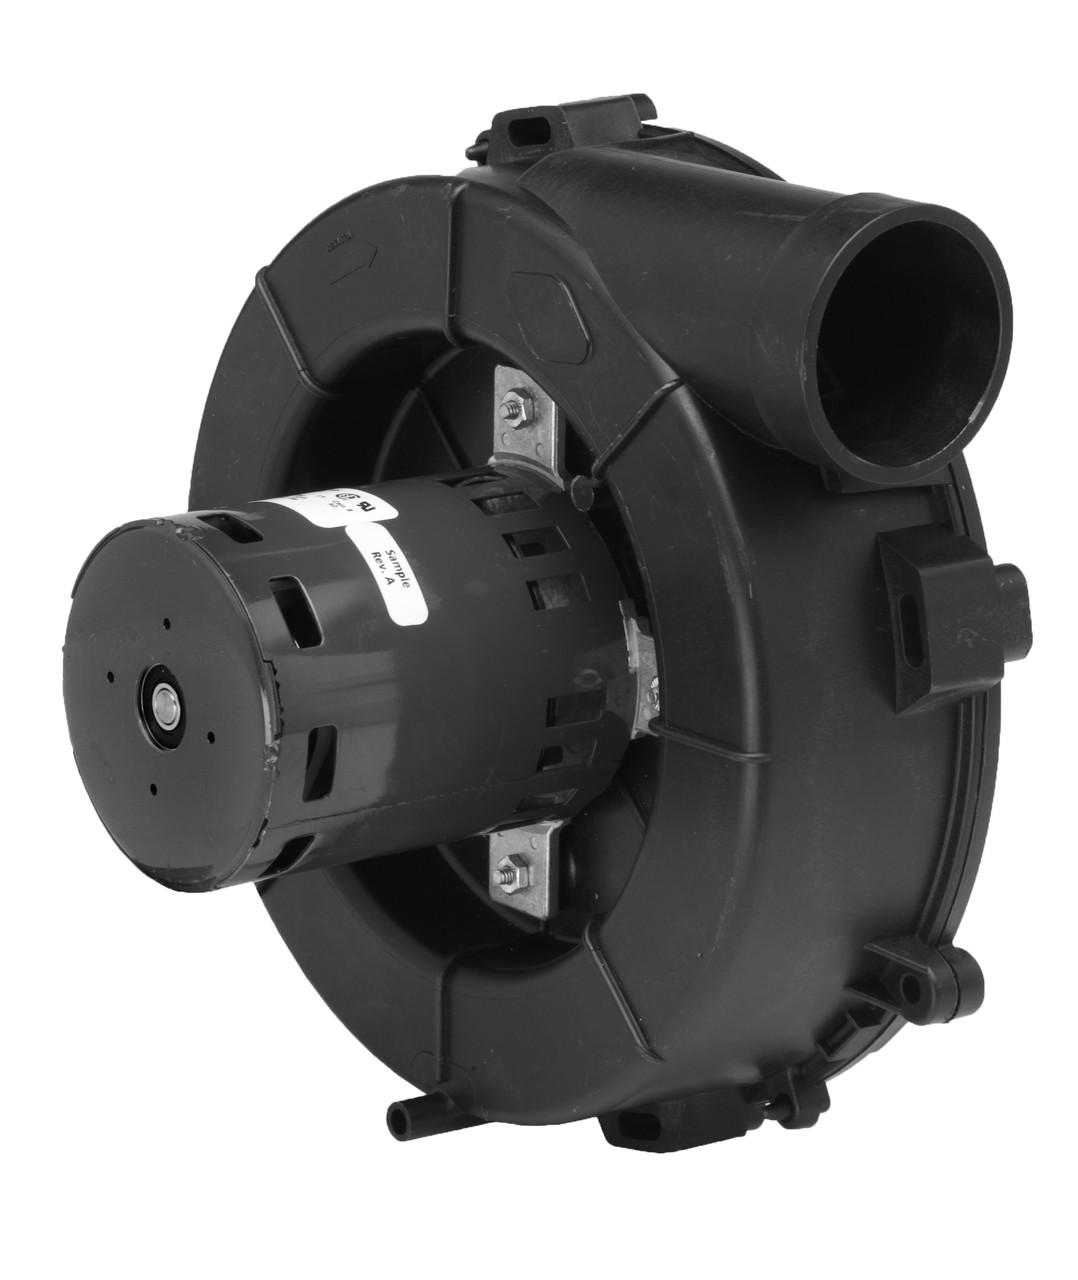 lennox furnace draft inducer blower 115v 49l5301 7021 10841 lennox furnace draft inducer blower 115v 49l5301 7021 10841 fasco a203